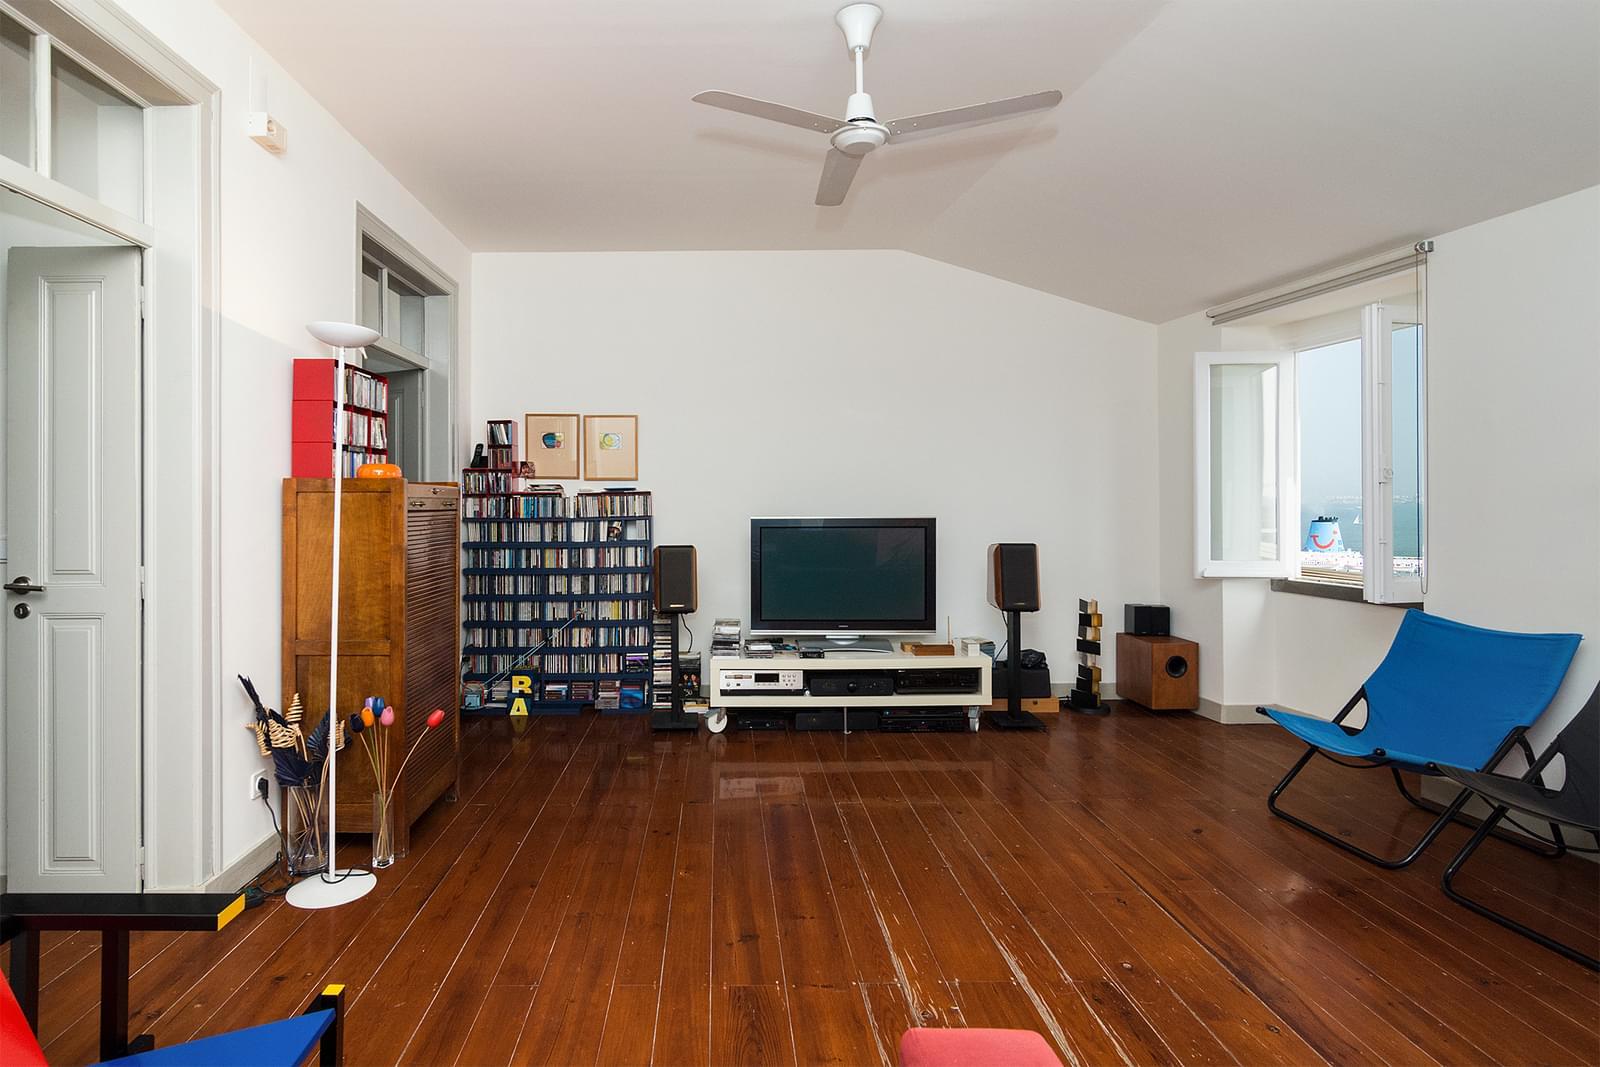 pf17052-apartamento-t3-lisboa-f18be8ac-fcf5-43f7-b686-465851e6d9d6